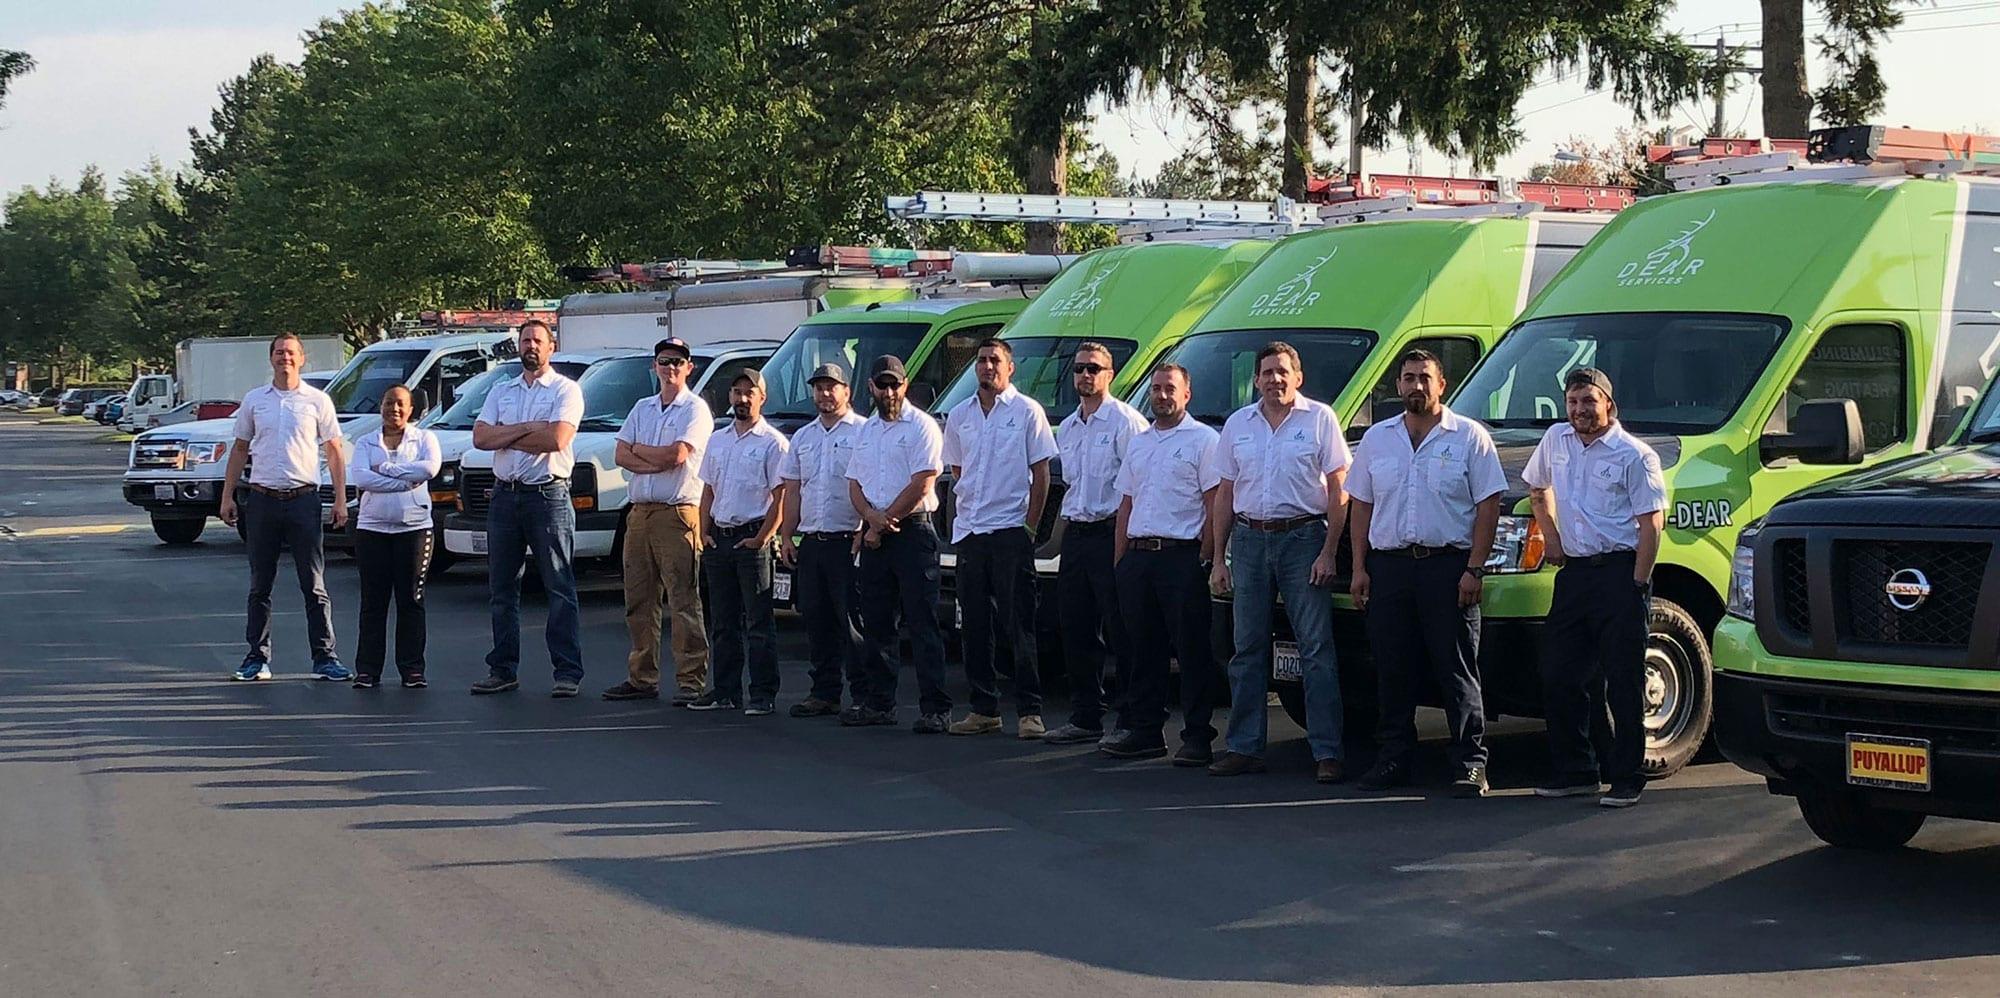 Dear Services Team Photo